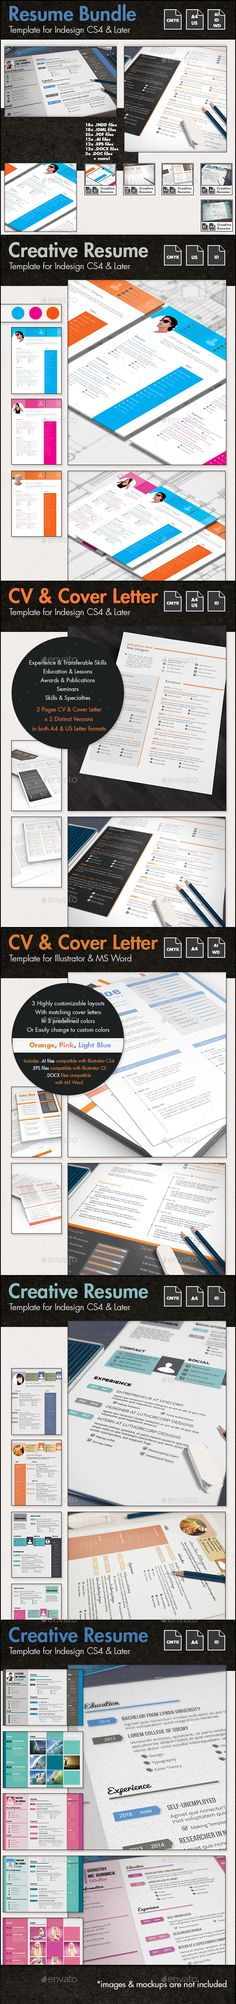 Presentation Folder Fonts, Print templates and Stationery - resume presentation folder